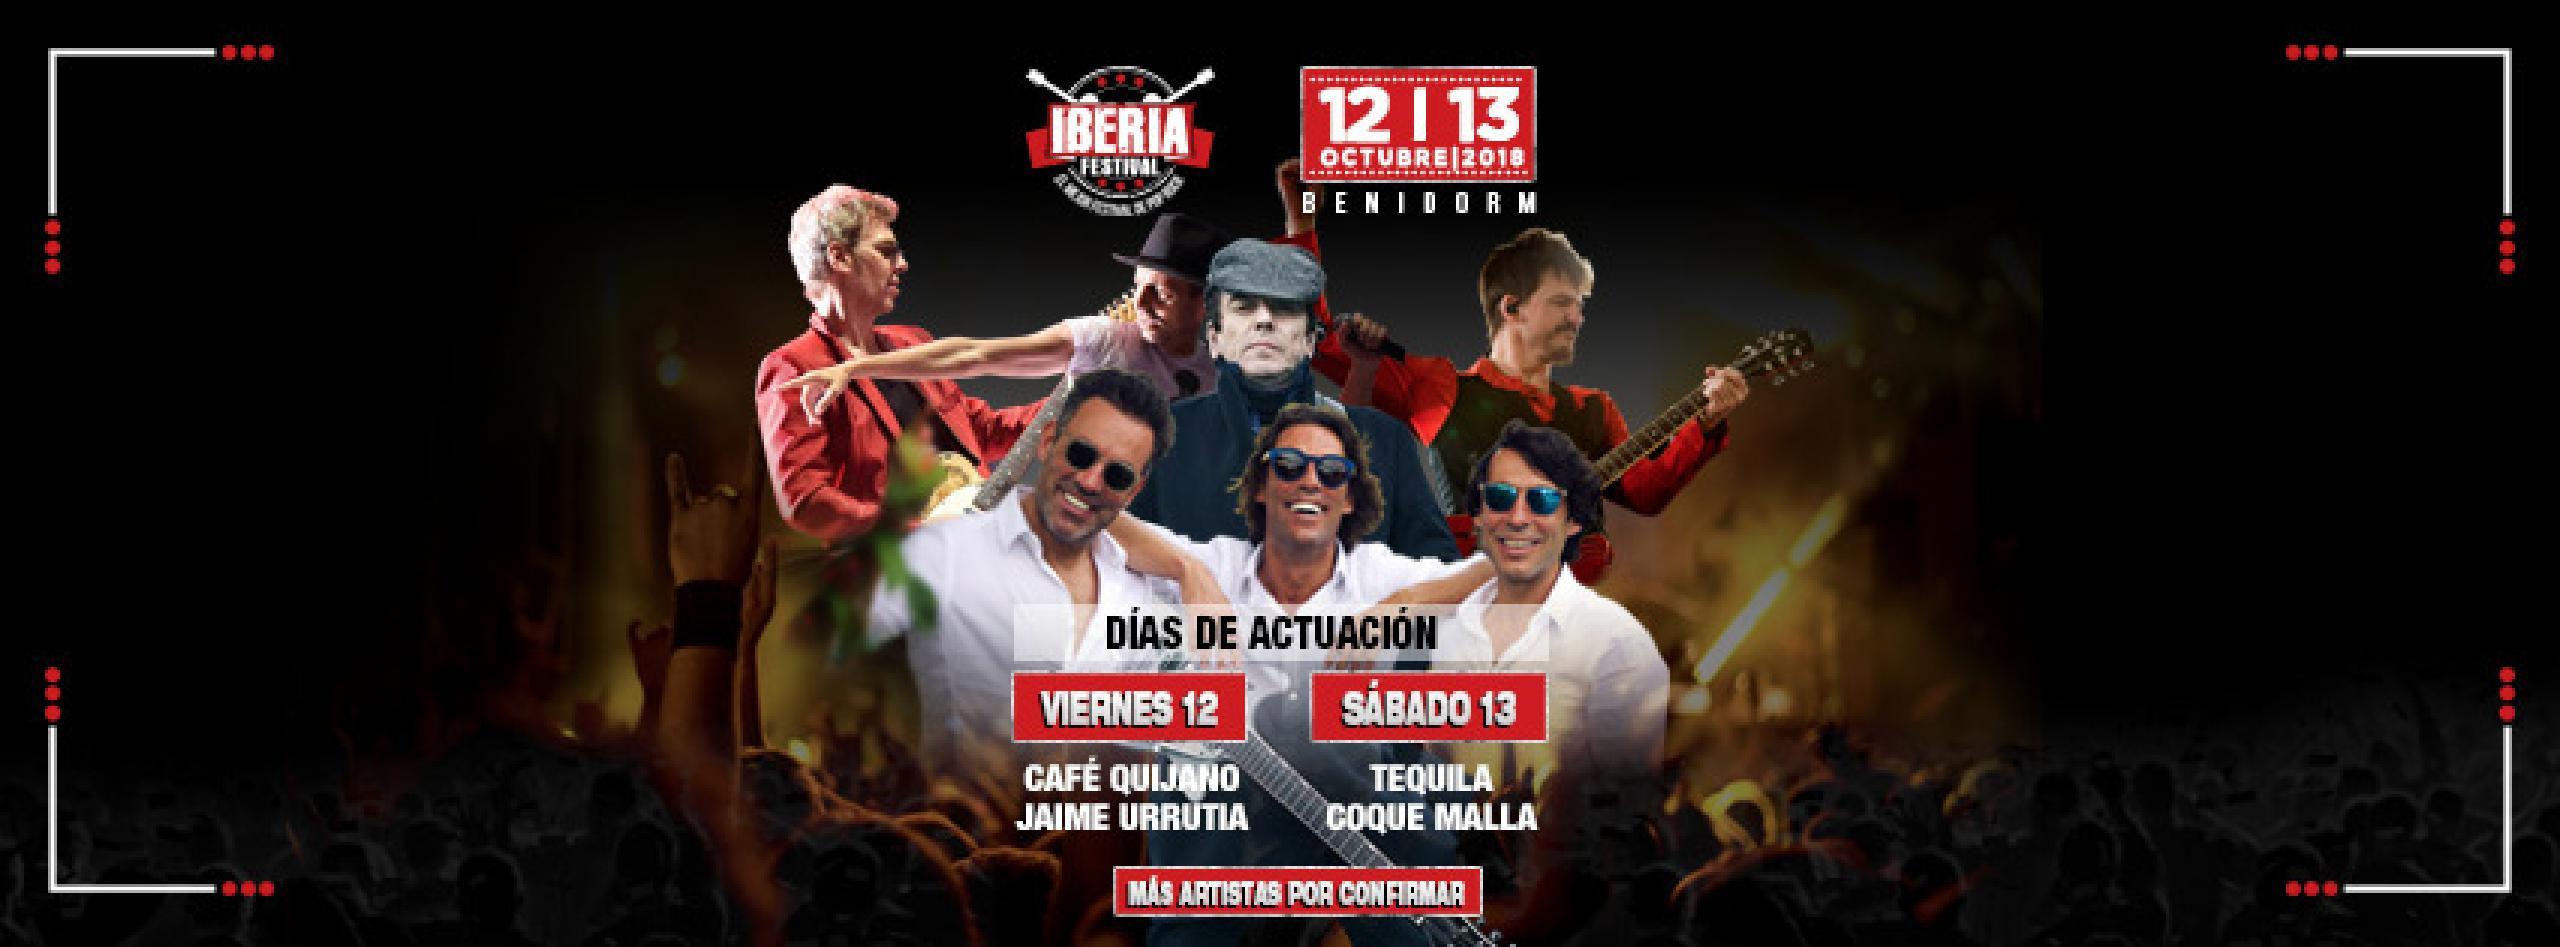 Cartel Iberia Festival 2018 Benidorm